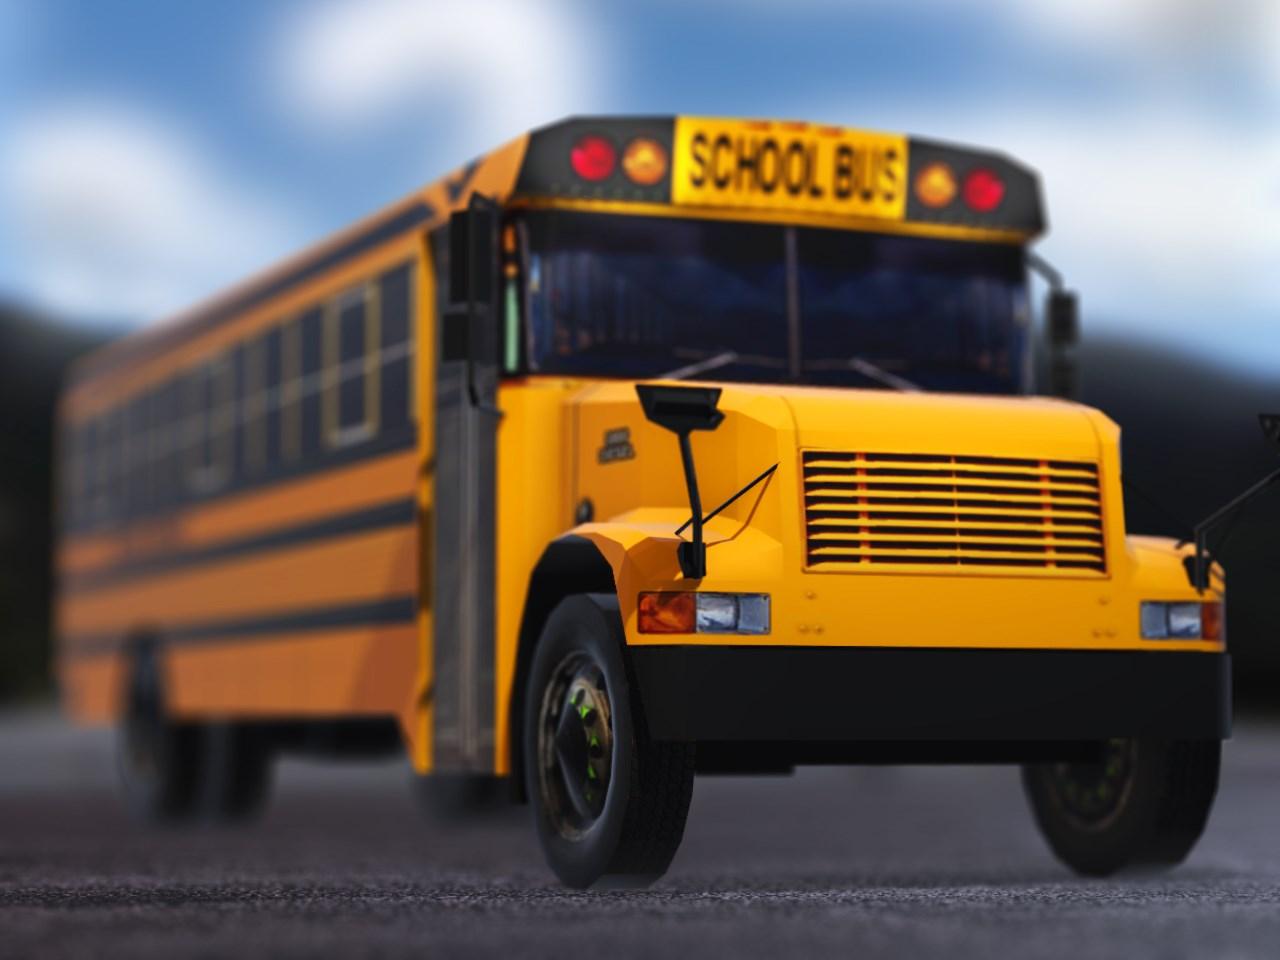 SCHOOL BUS OTS_1503958922320.jpg